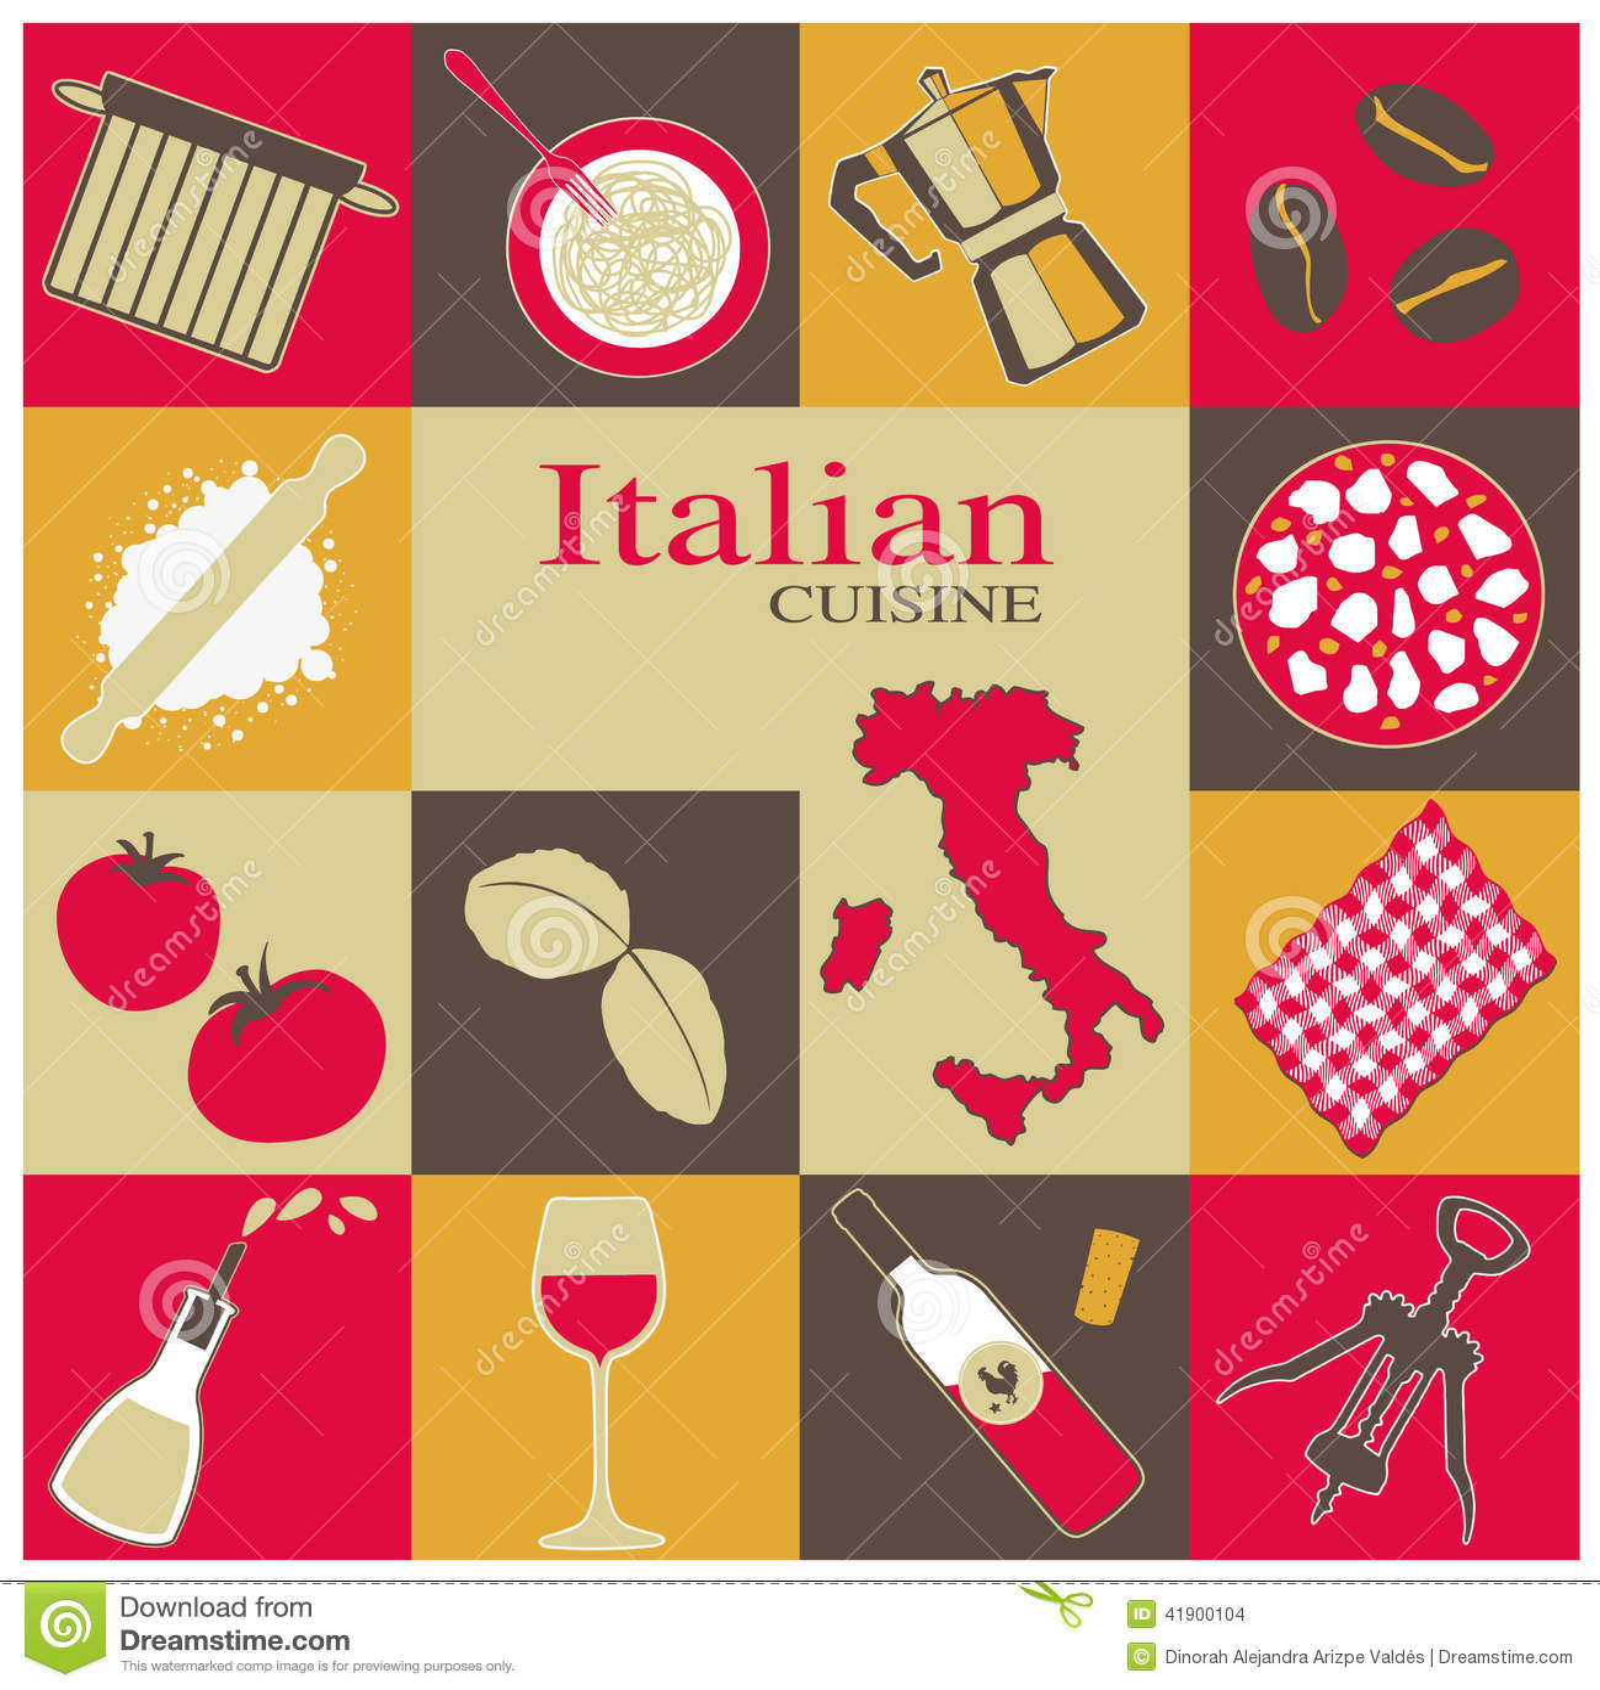 Italian Cuisine Icons Set Stock Vector Image 41900104